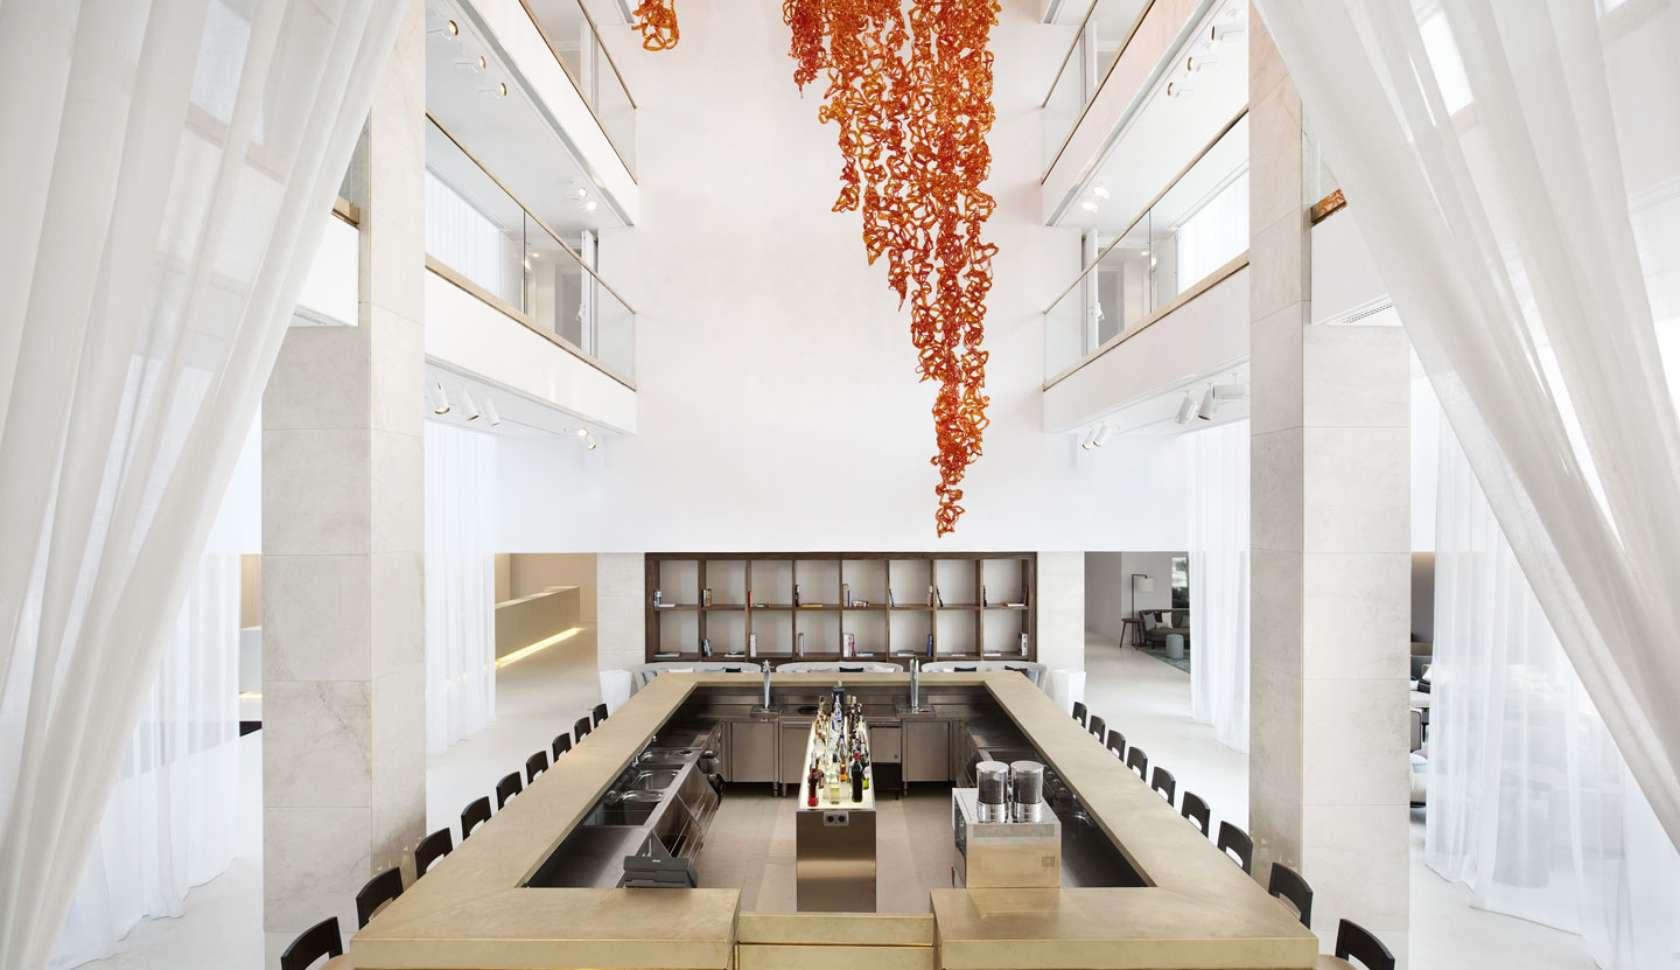 matteo thun partners architizer. Black Bedroom Furniture Sets. Home Design Ideas